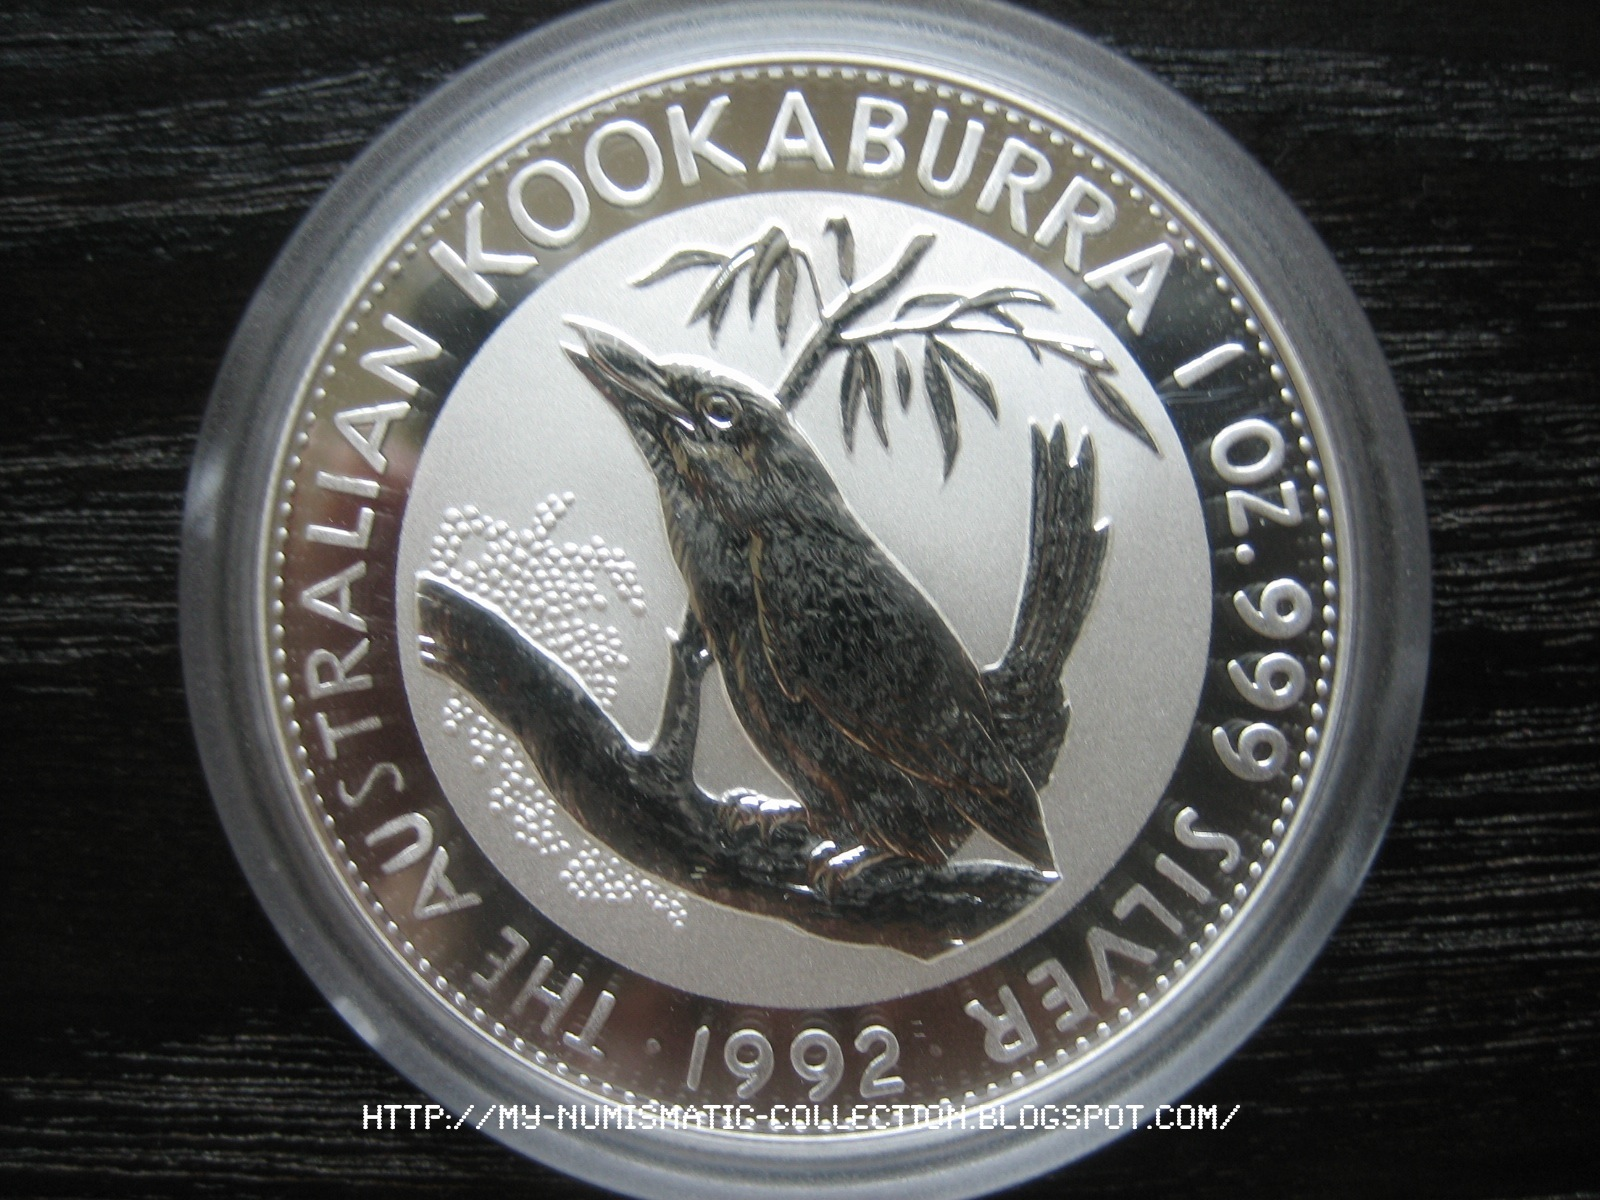 Numismatic Collection 1992 Australian Silver Kookaburra